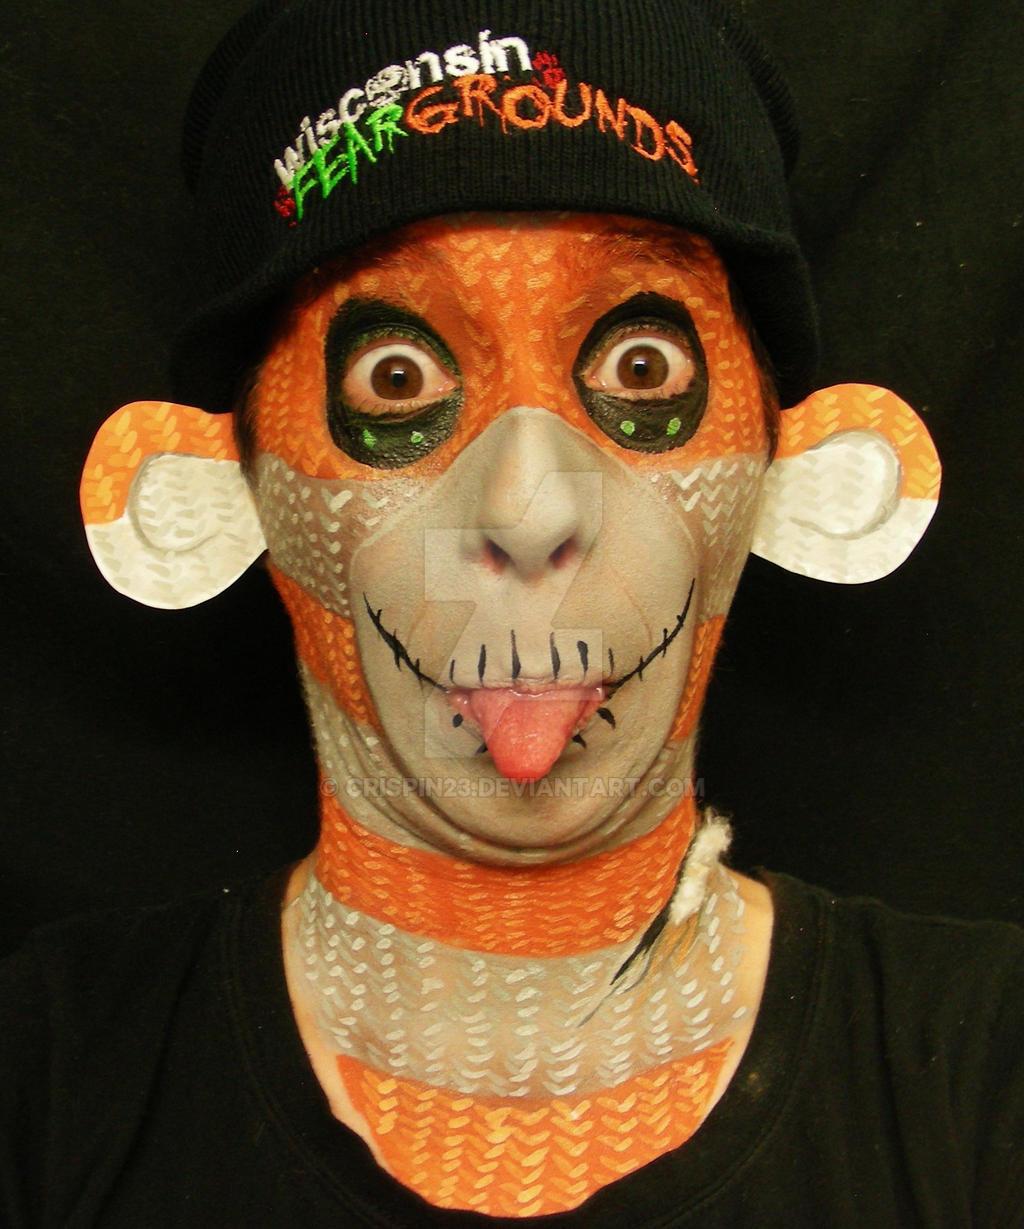 halloween sock monkey : silly!crispin23 on deviantart